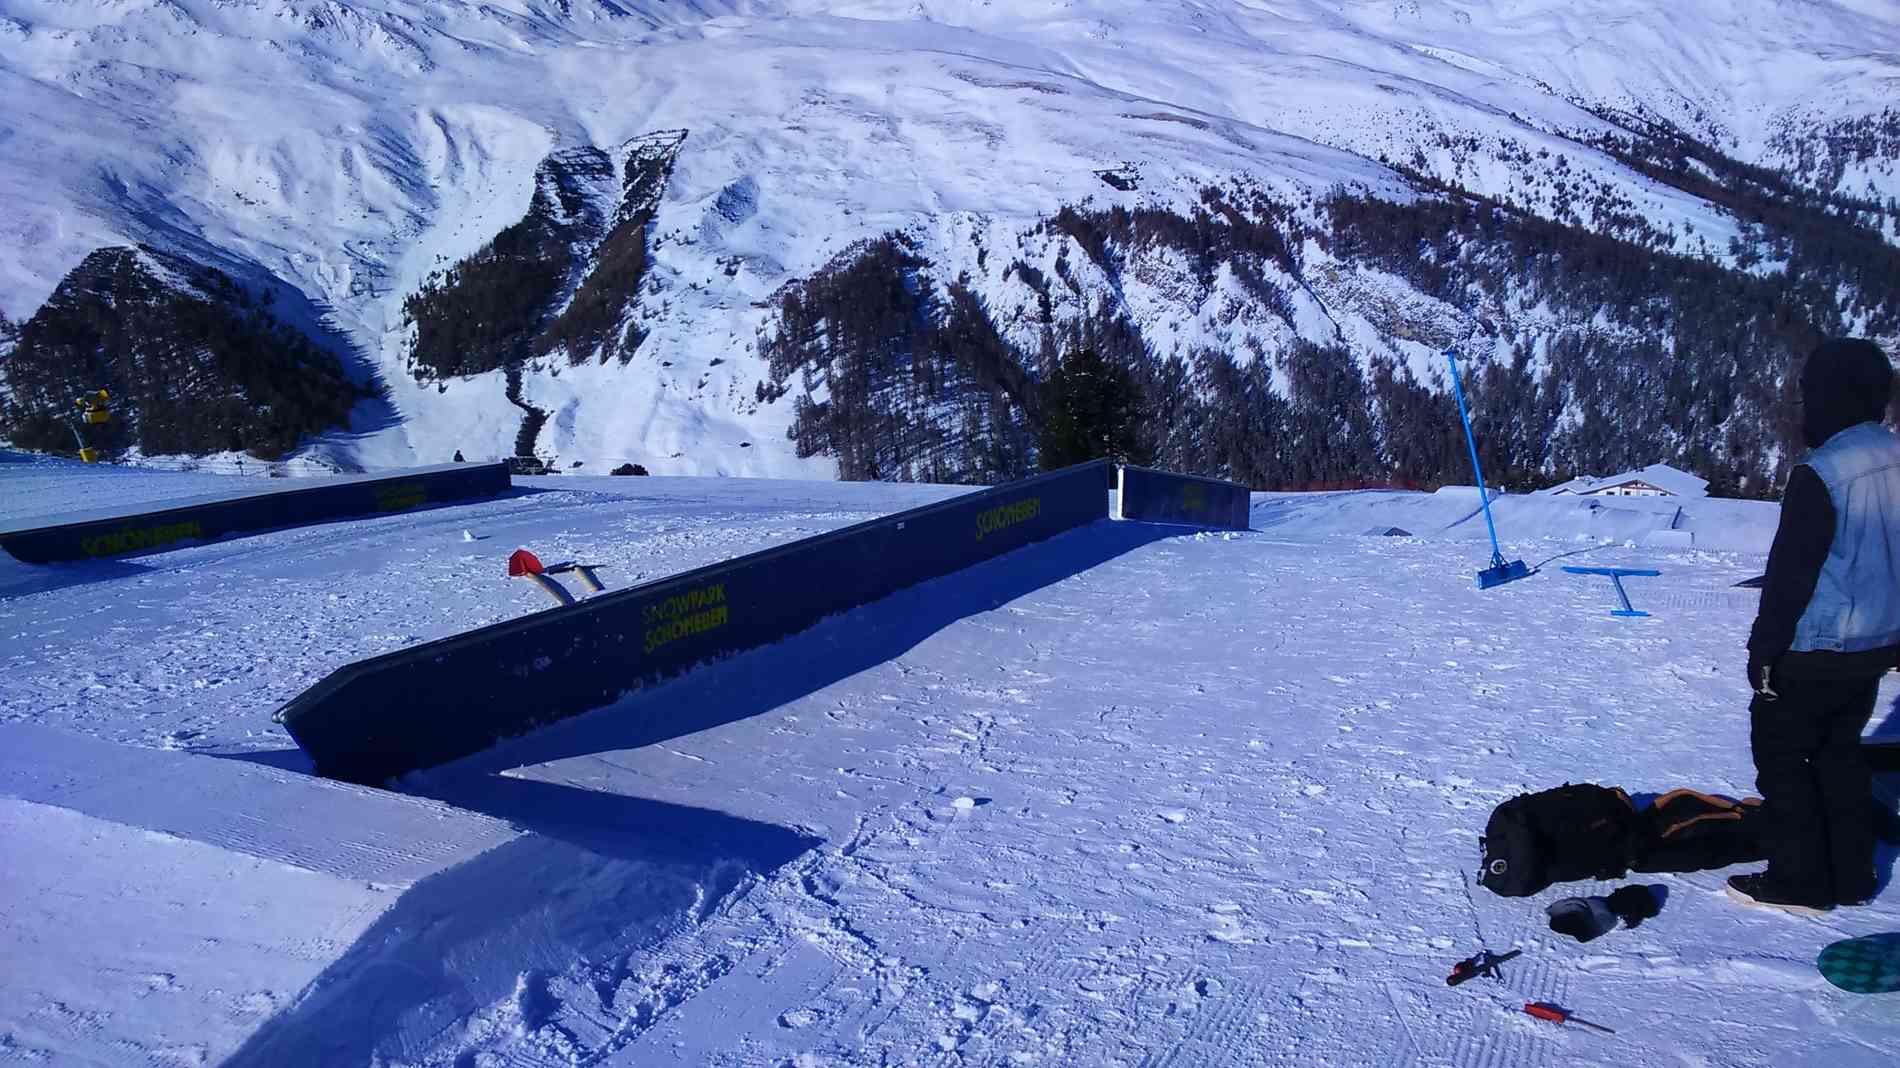 Snowpark Rail Flat/Down 11m